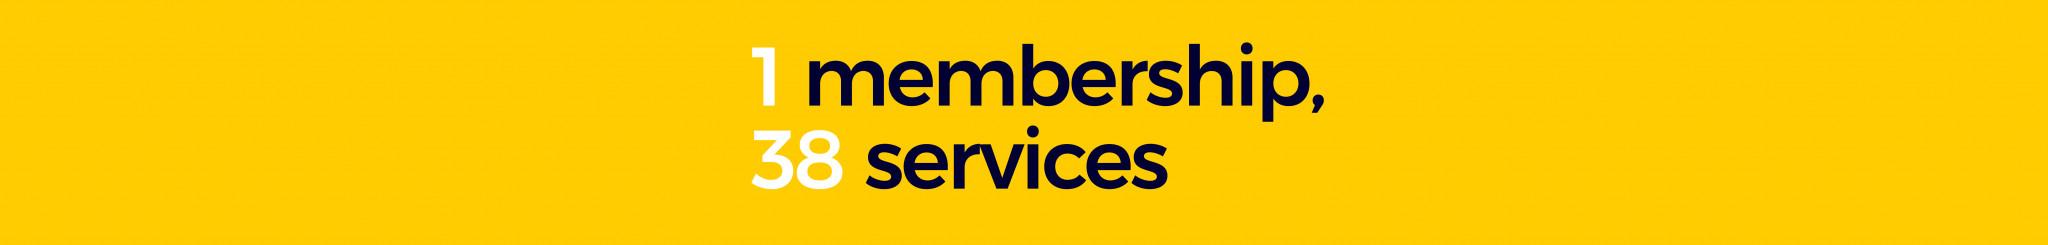 1_membership,_38_services